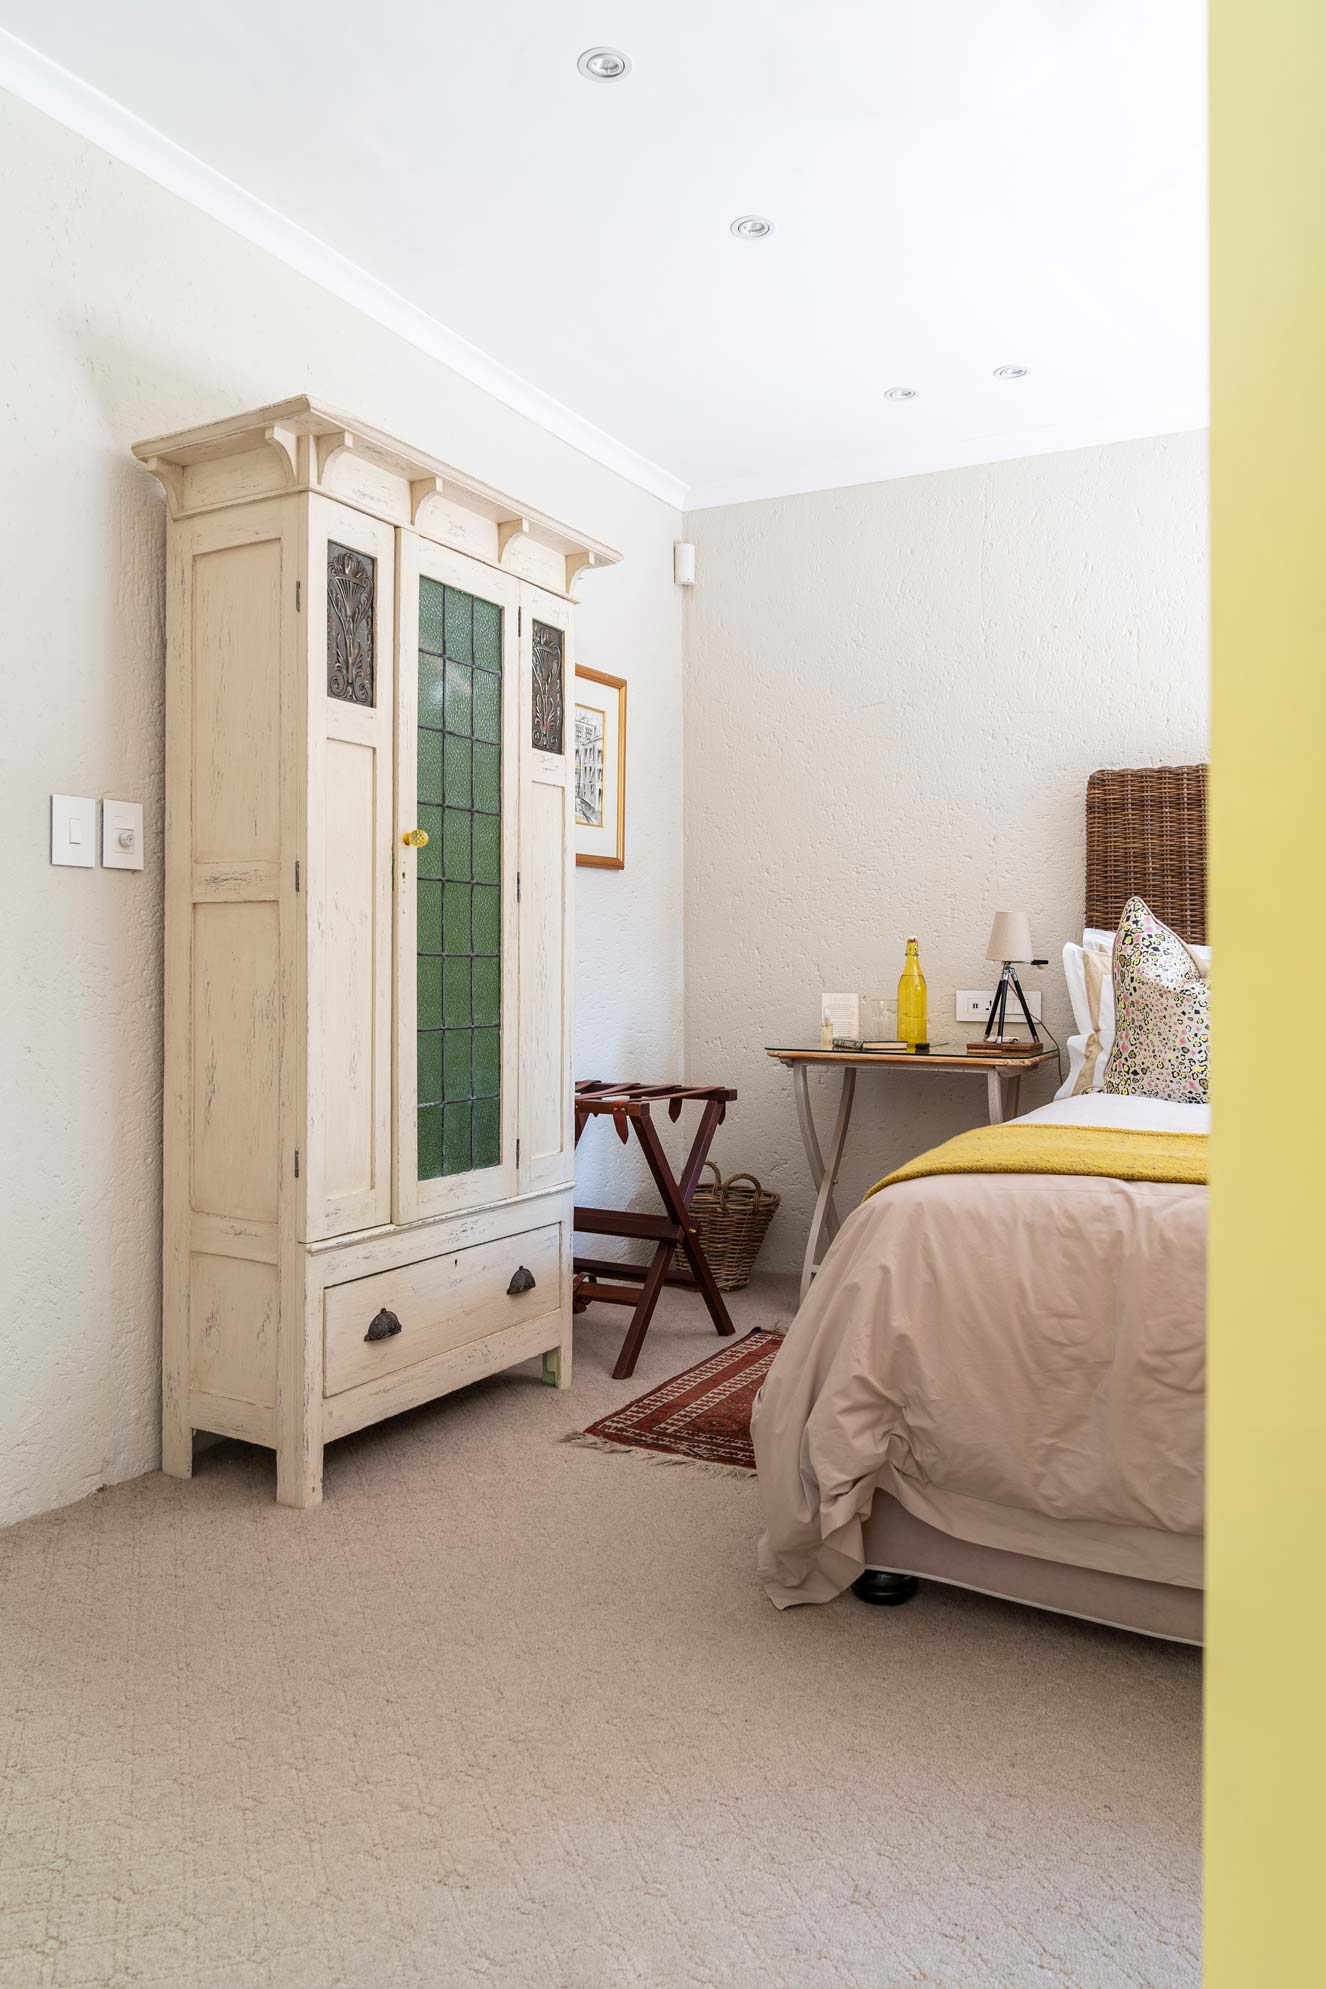 Interior Photography by Soonafterstudio for 2Mokolo Bed & Breakfast